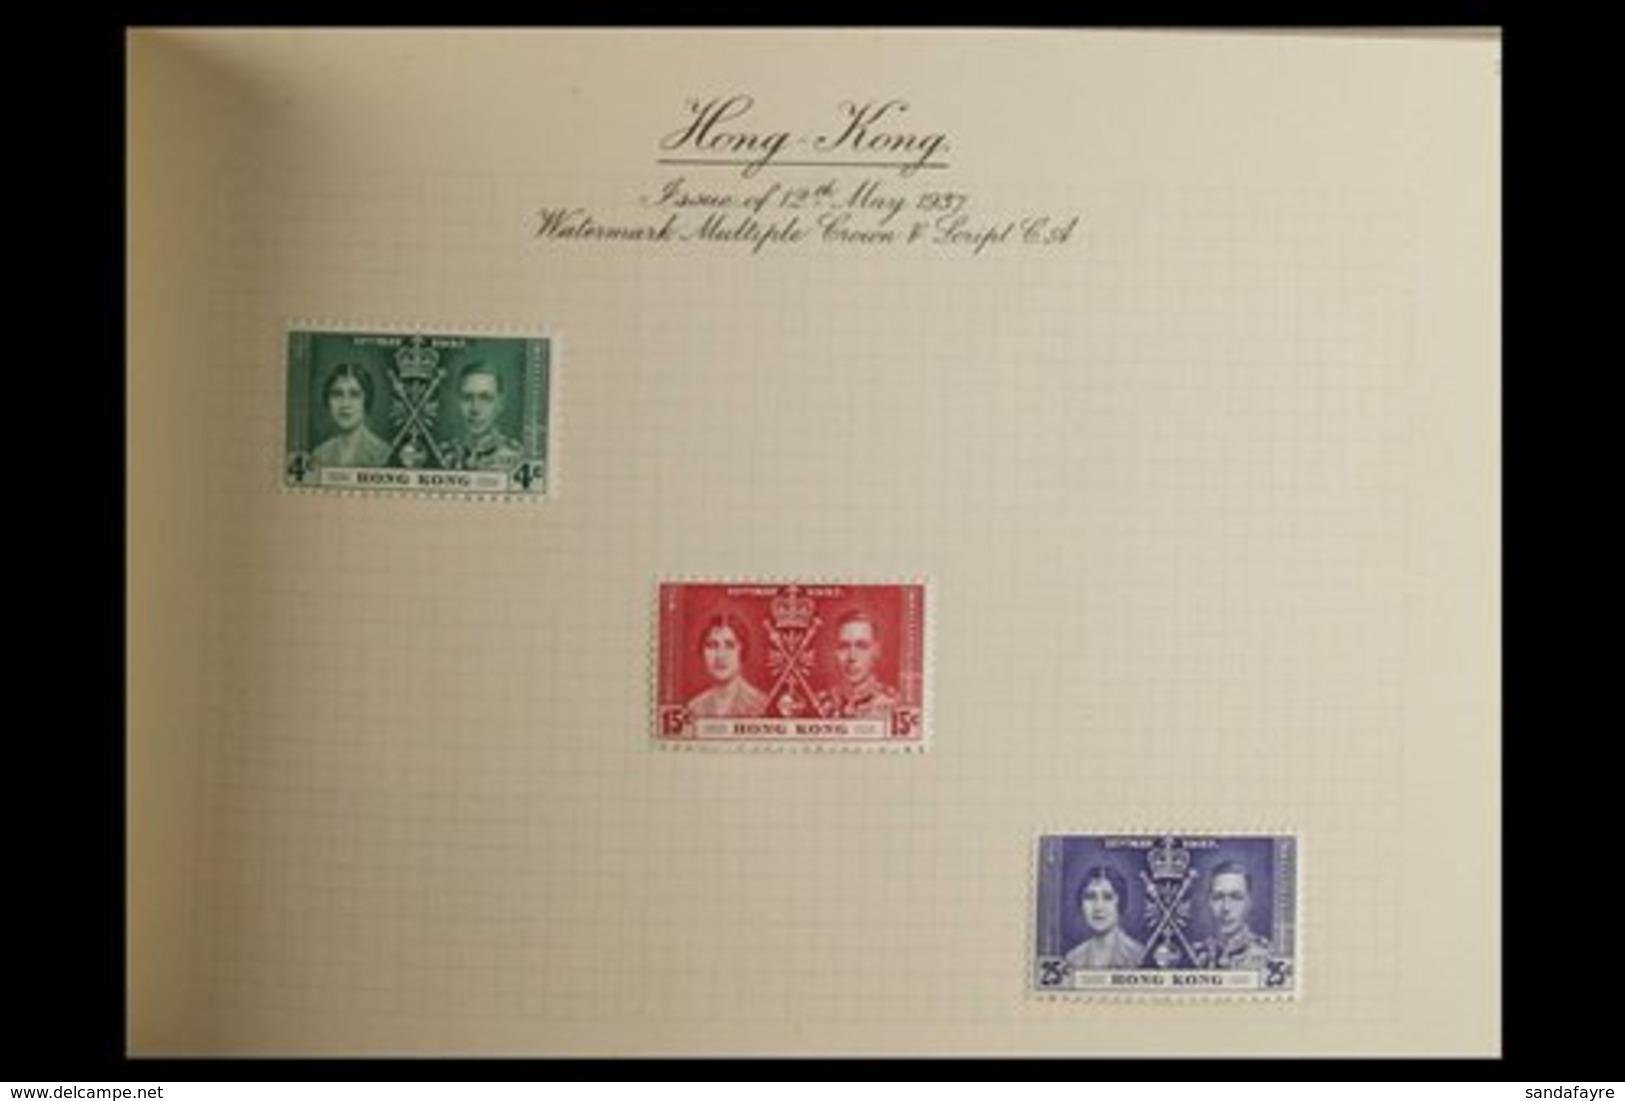 BRITISH COMMONWEALTH OMNIBUS FINE MINT COLLECTIONS. 1937-1953 FINE MINT COLLECTIONS In Special Dedicated Albums. Compri - Stamps